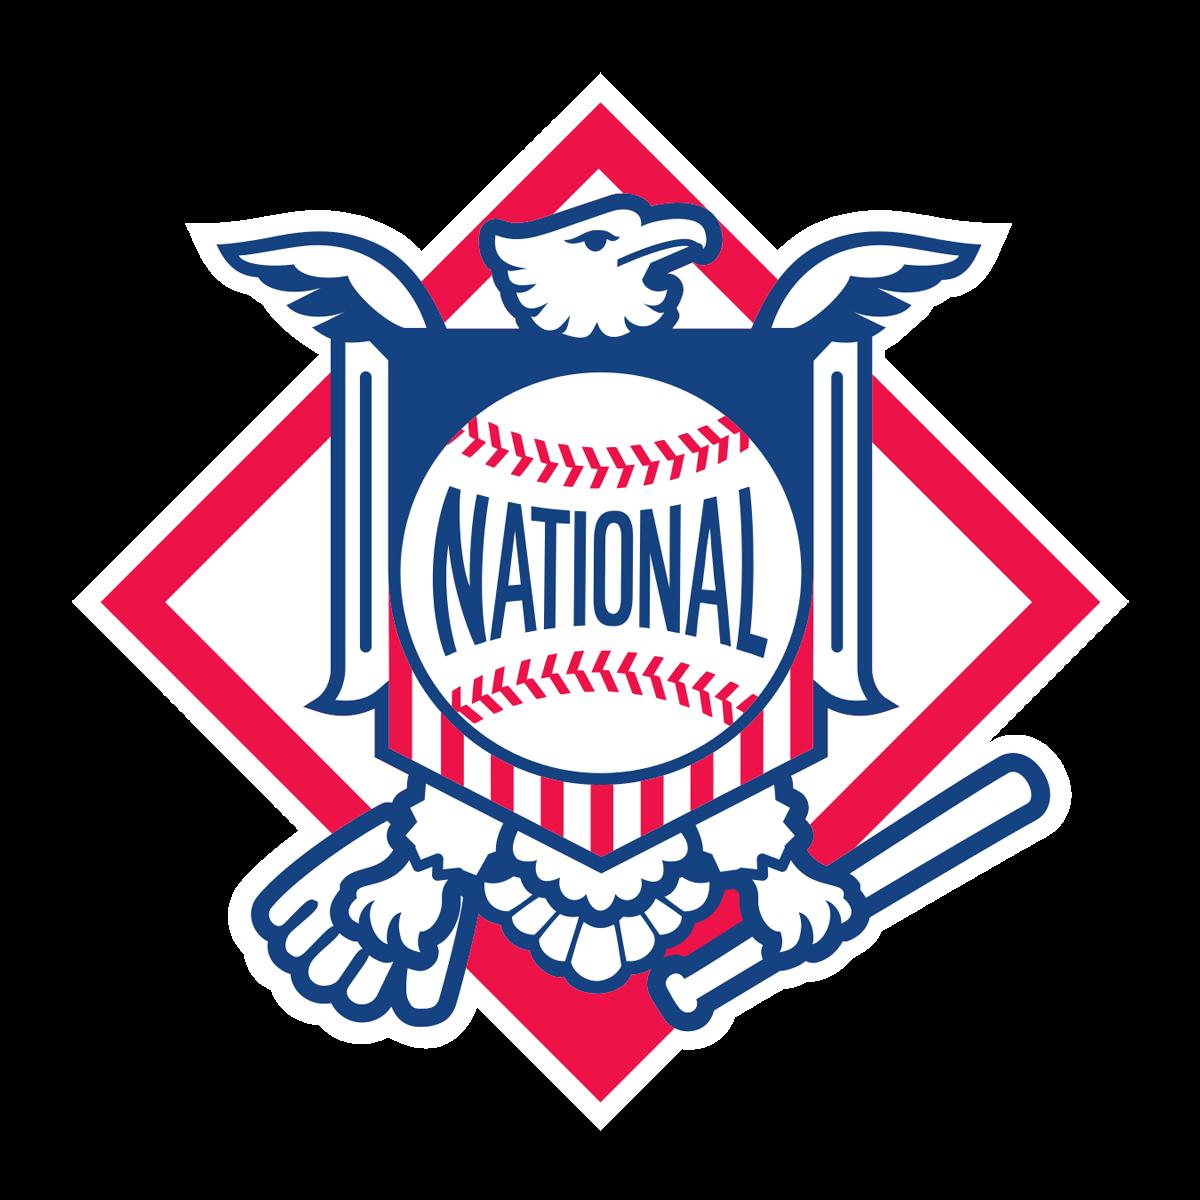 MLB National League transparent logo